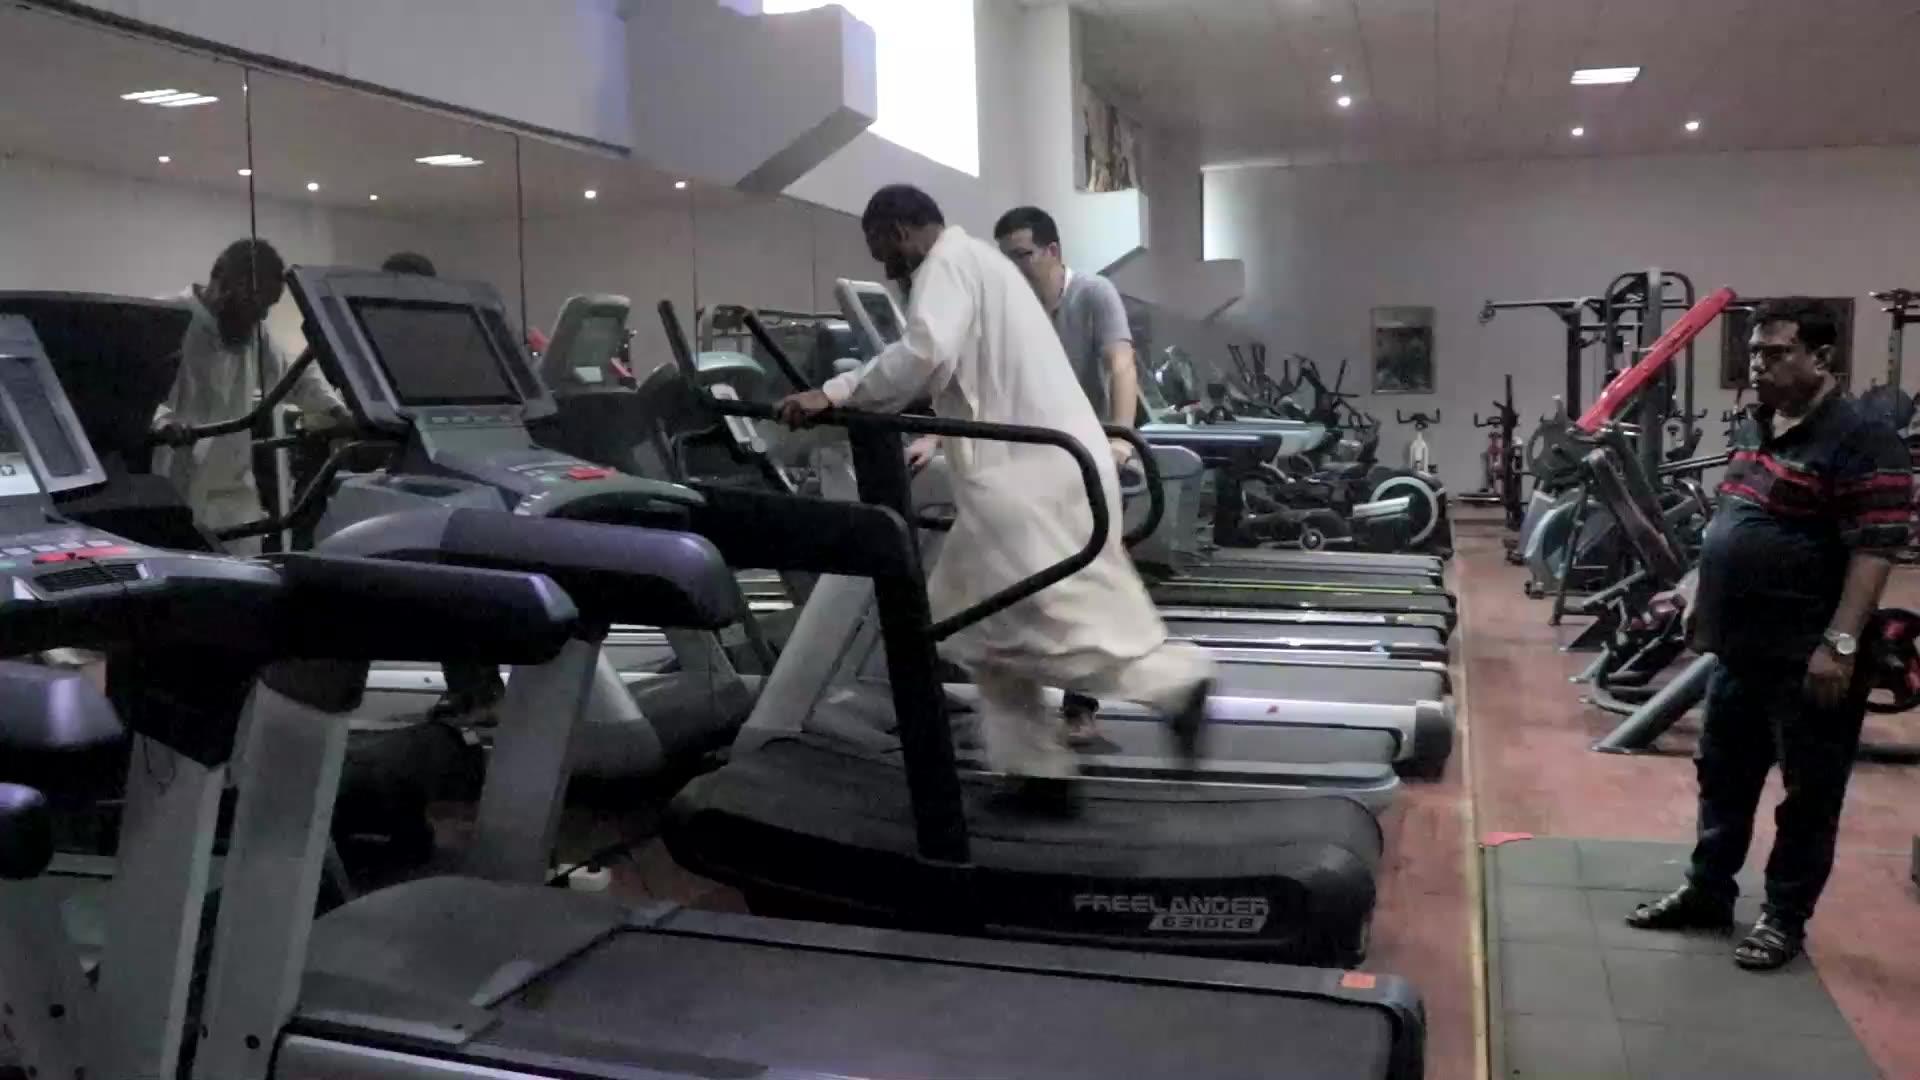 LJ-6310 Curved treadmill